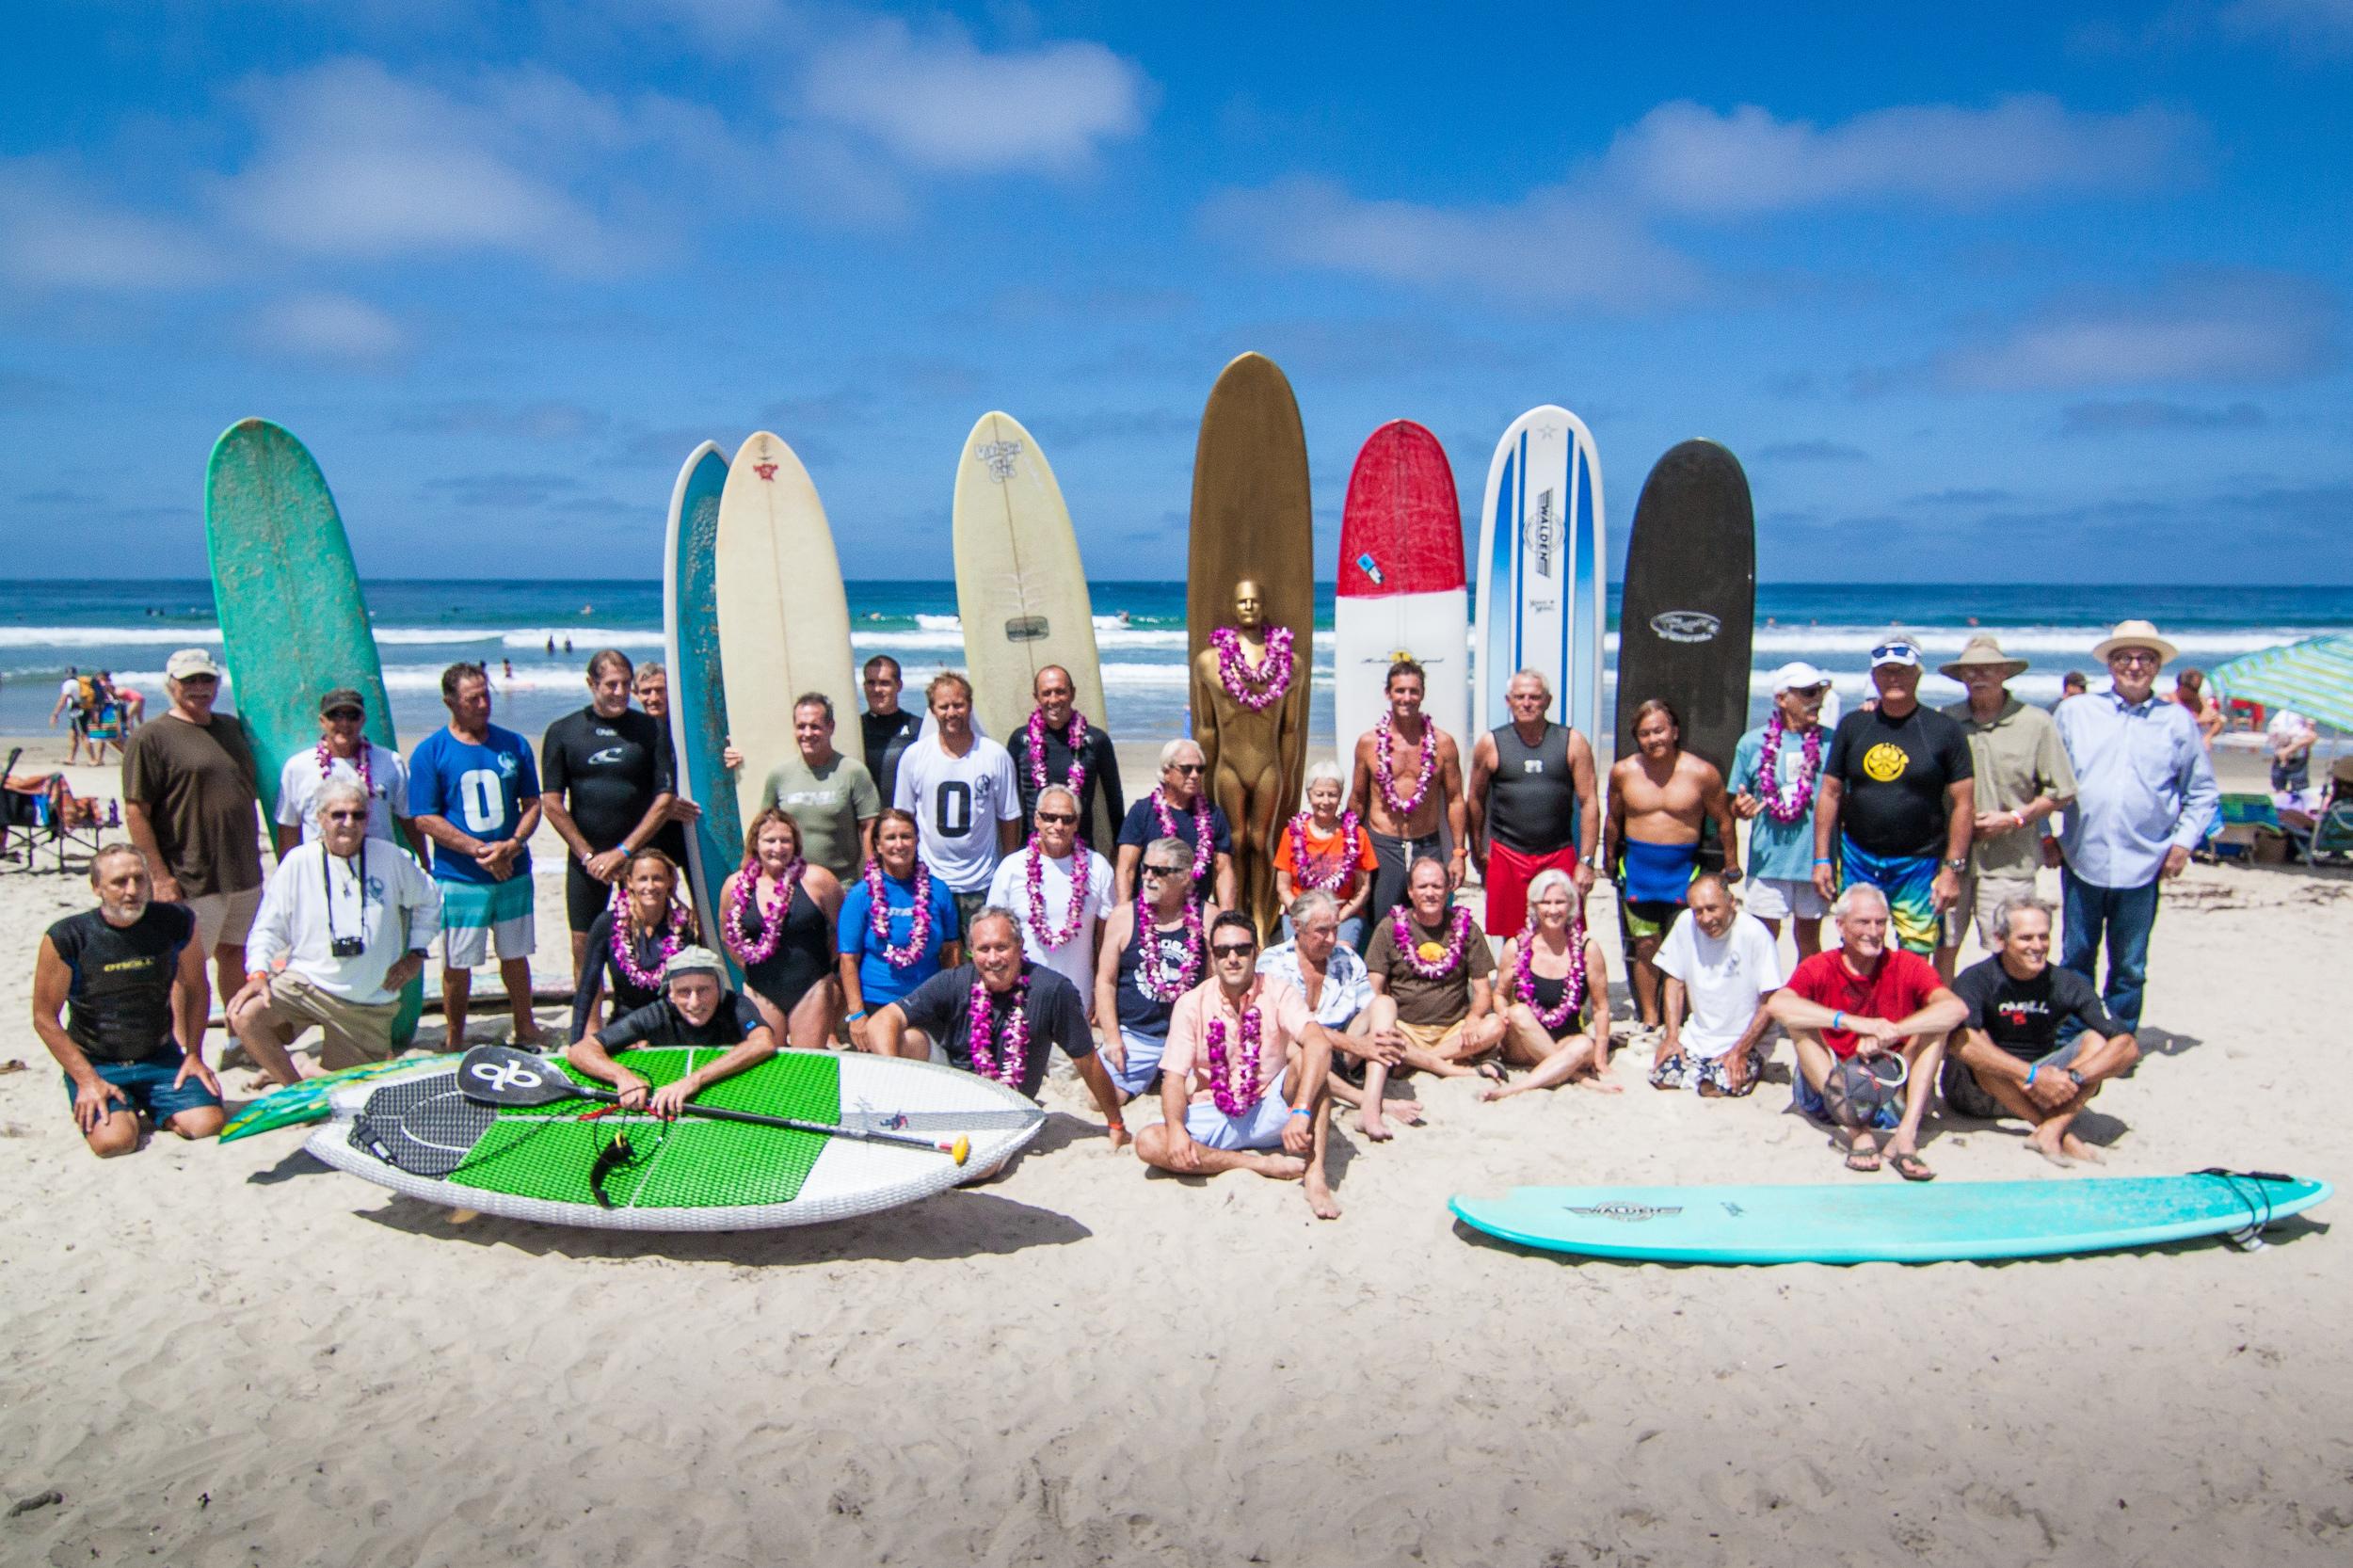 Luau 21-Surf Legends_photo_by_Todd_Barnes.jpg